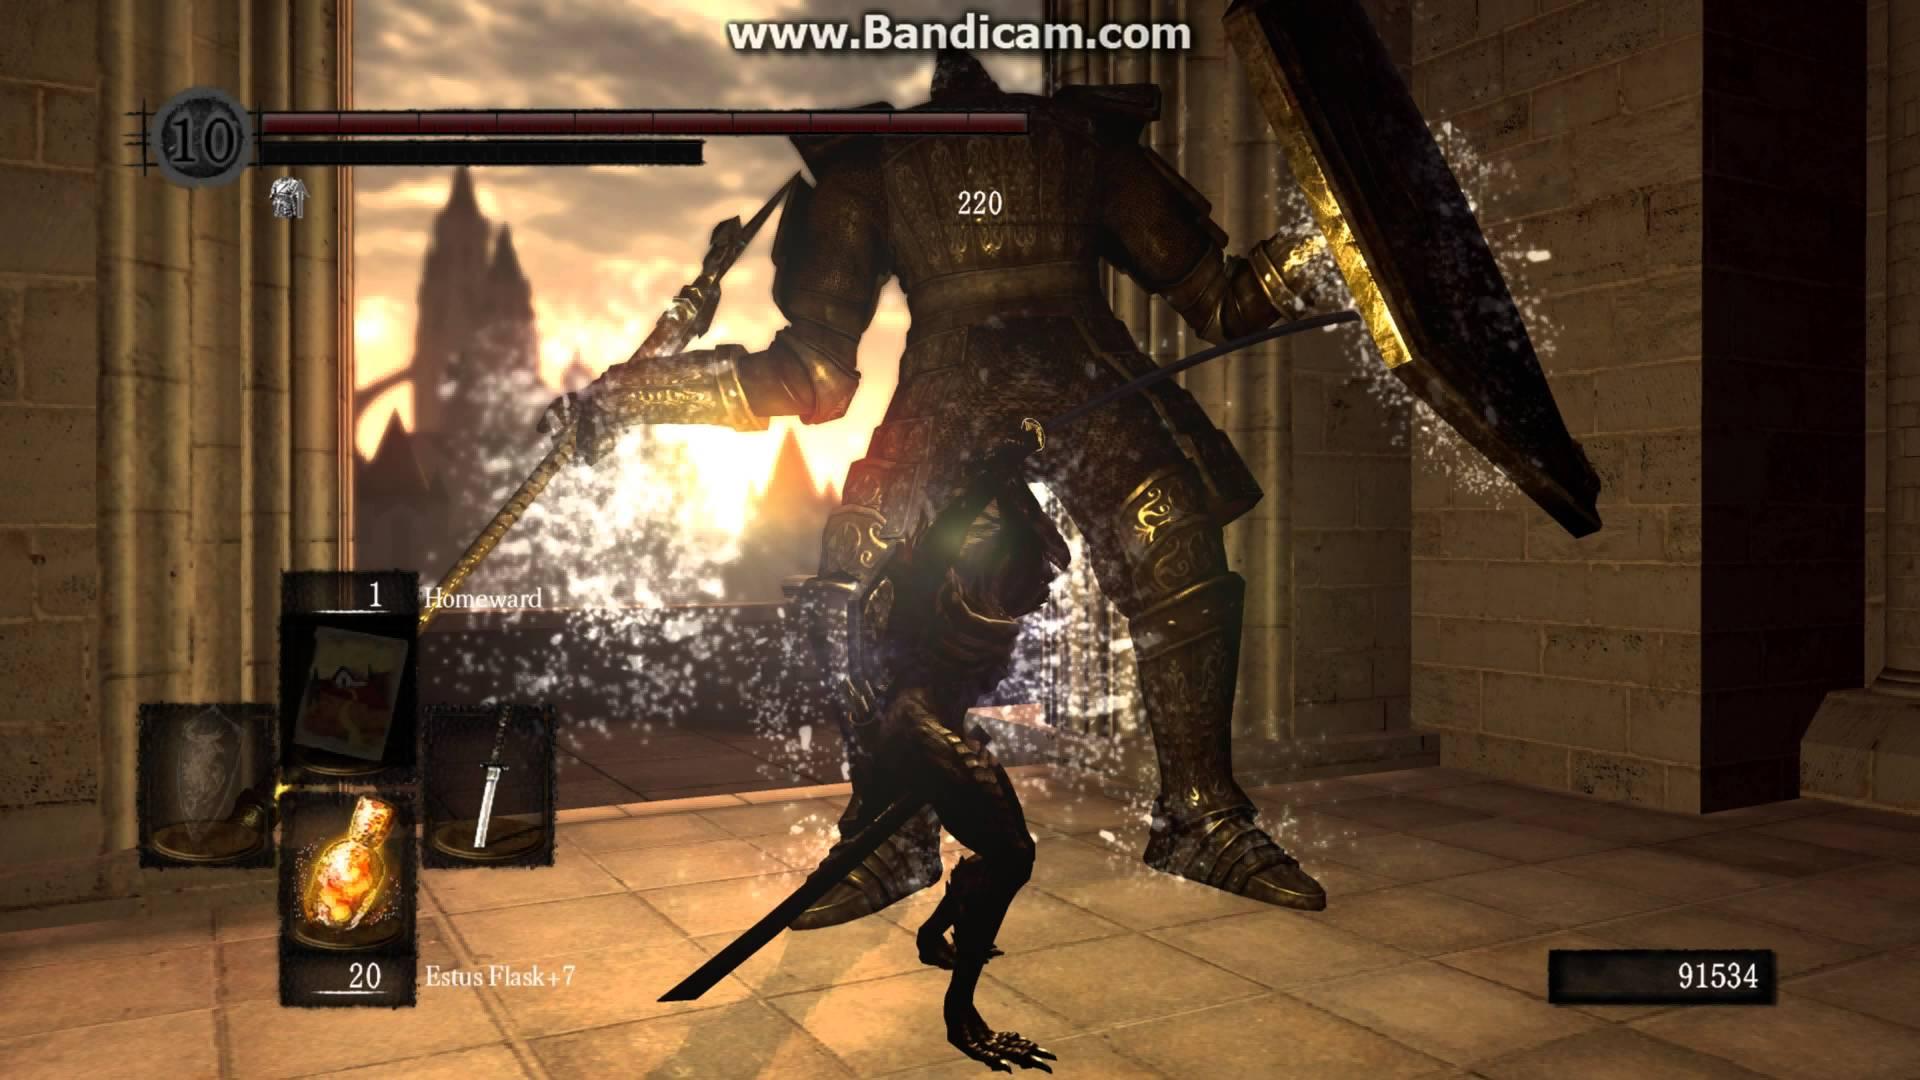 matchmaking en ligne Dark Souls 2 wikidot im 19 datant d'un 22 ans